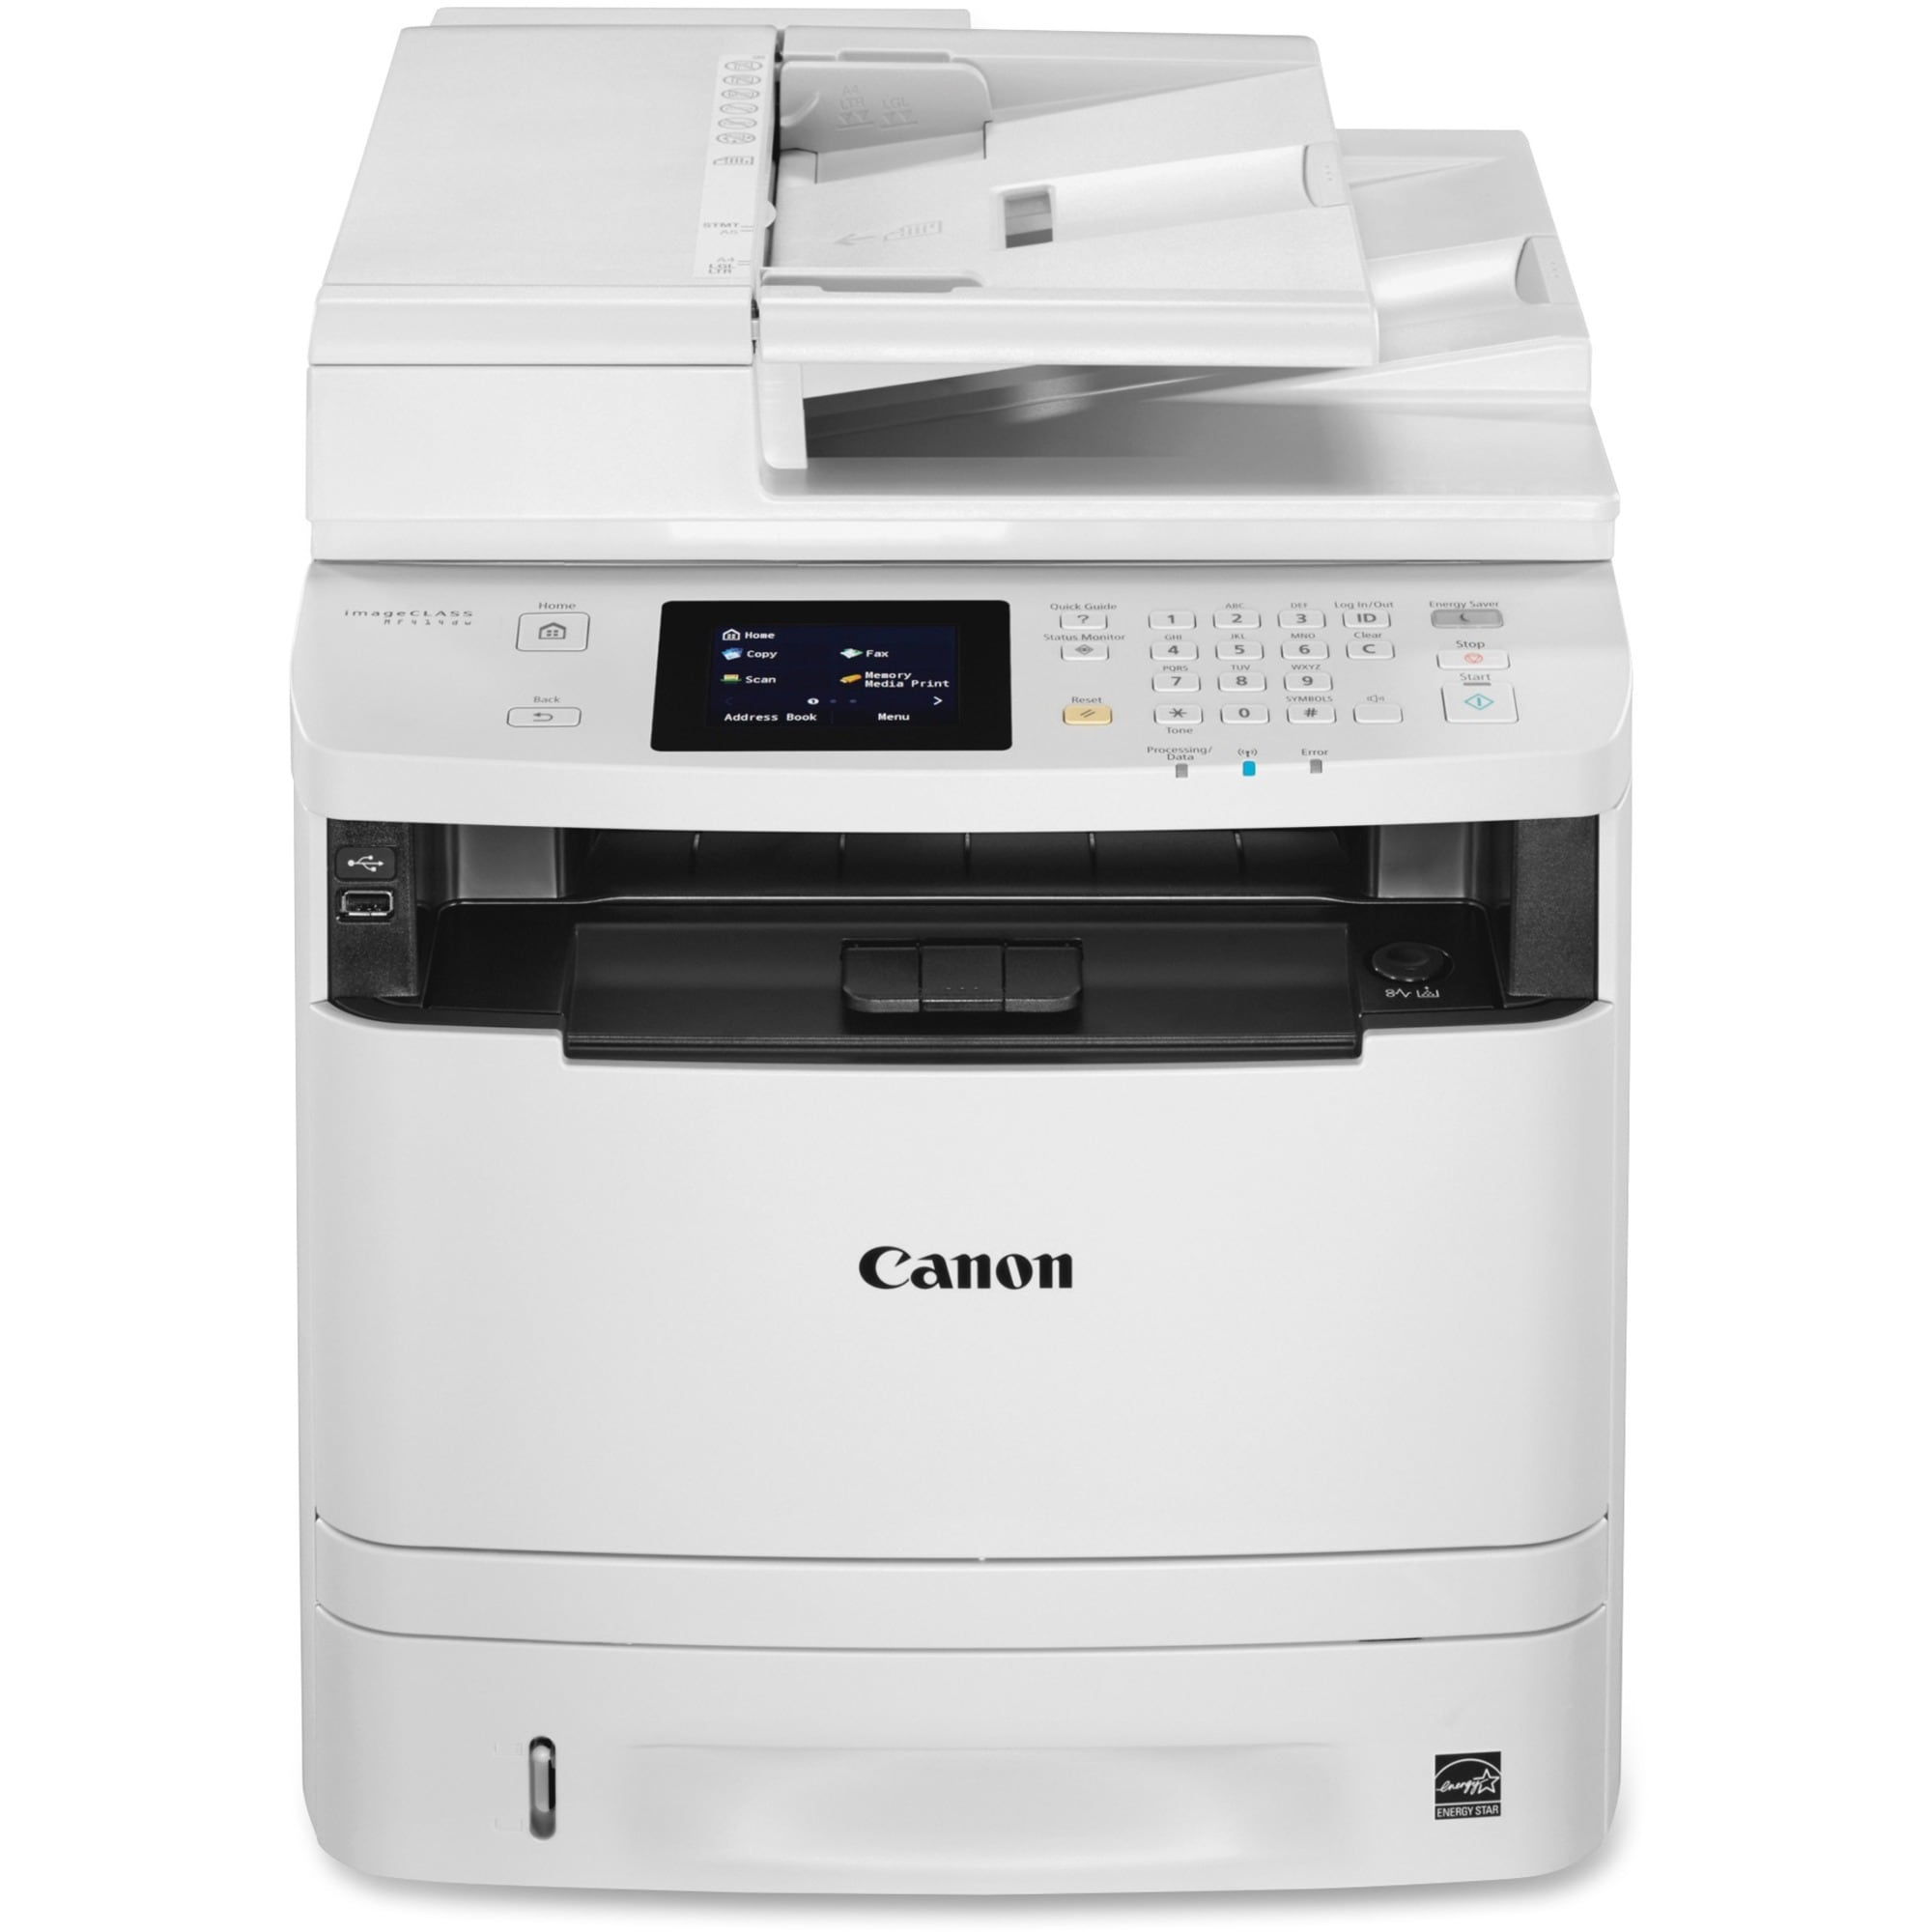 Canon imageCLASS MF414dw Laser Multifunction Printer - Mo...